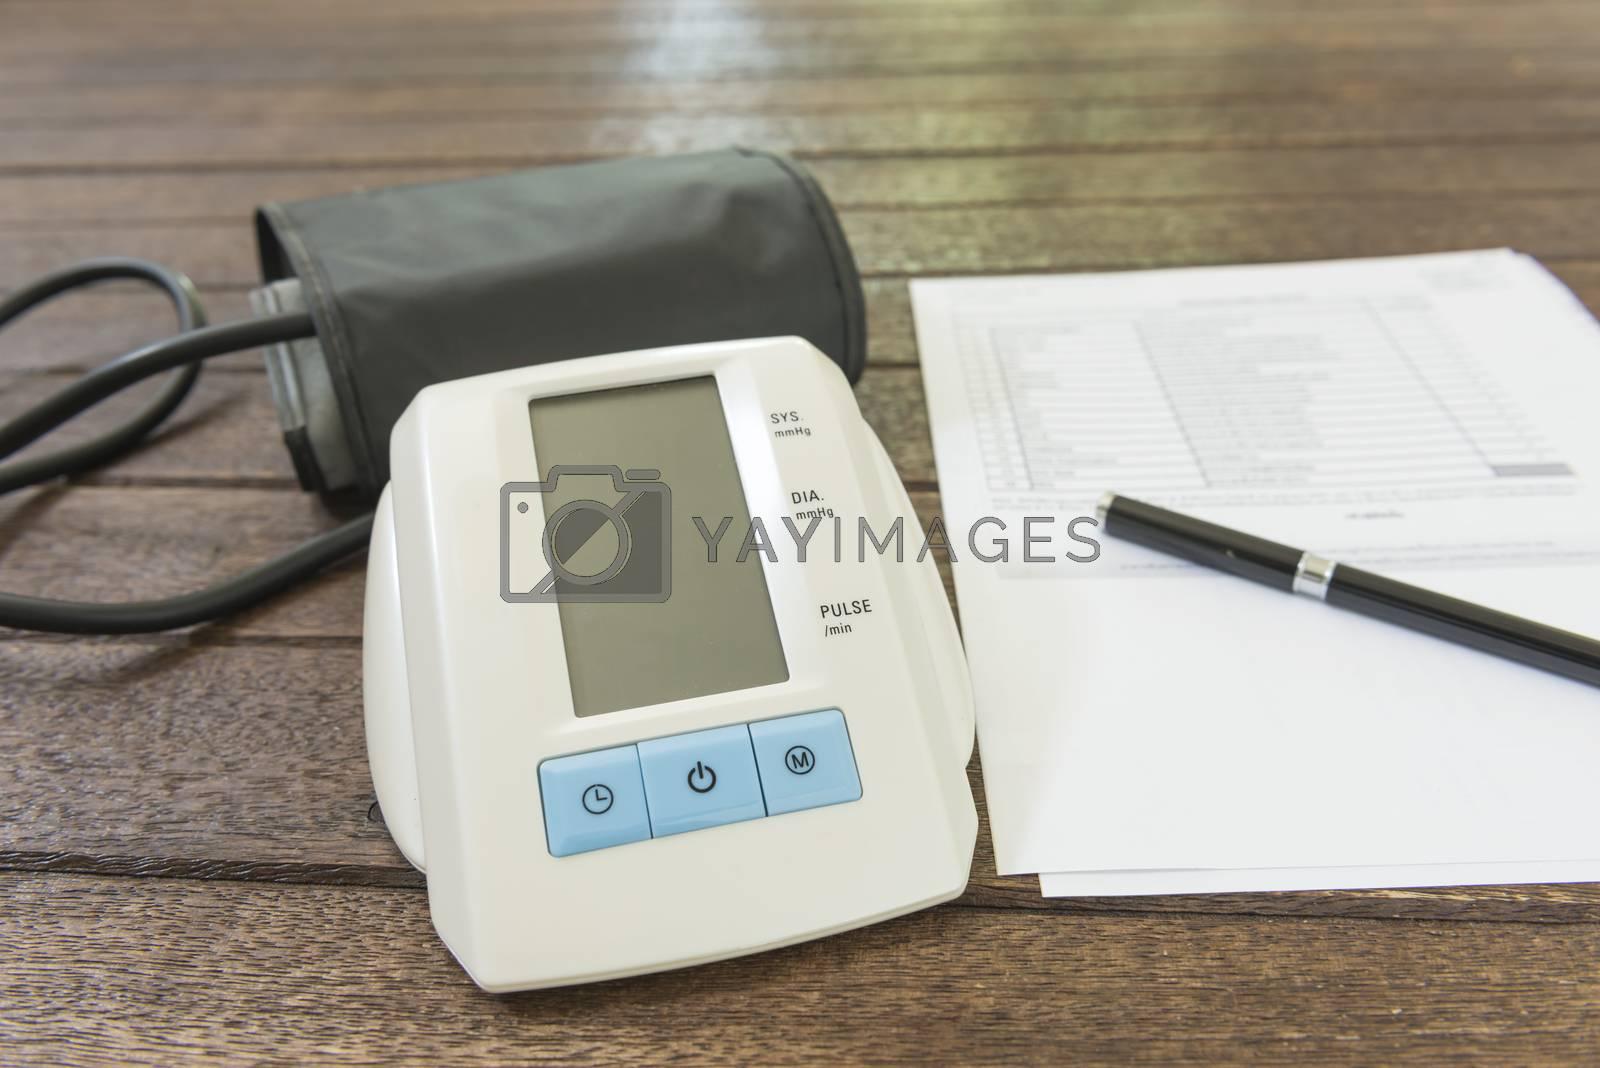 Digital blood pressure monitor on a wood table.